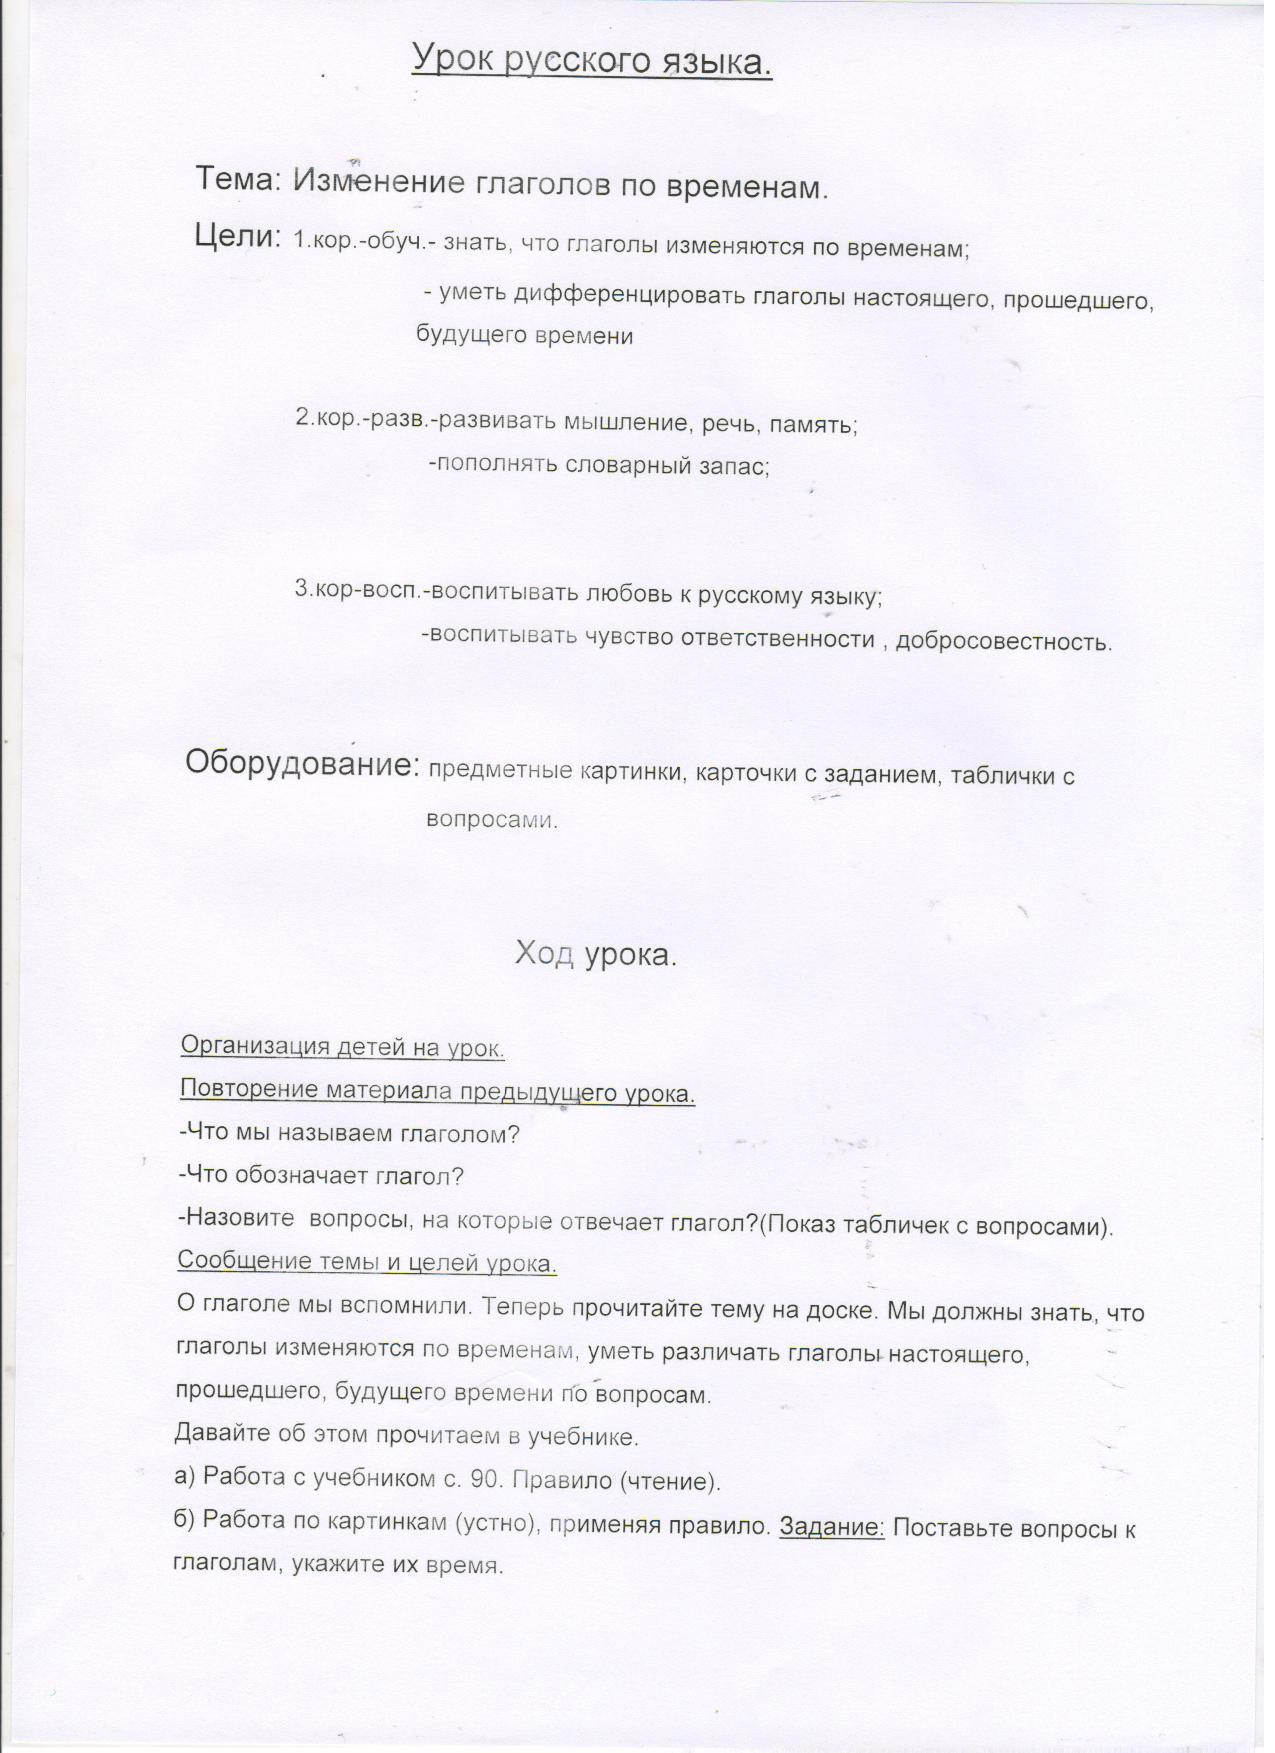 C:\Documents and Settings\Администратор\Рабочий стол\Тептякова Е.А. 014.jpg